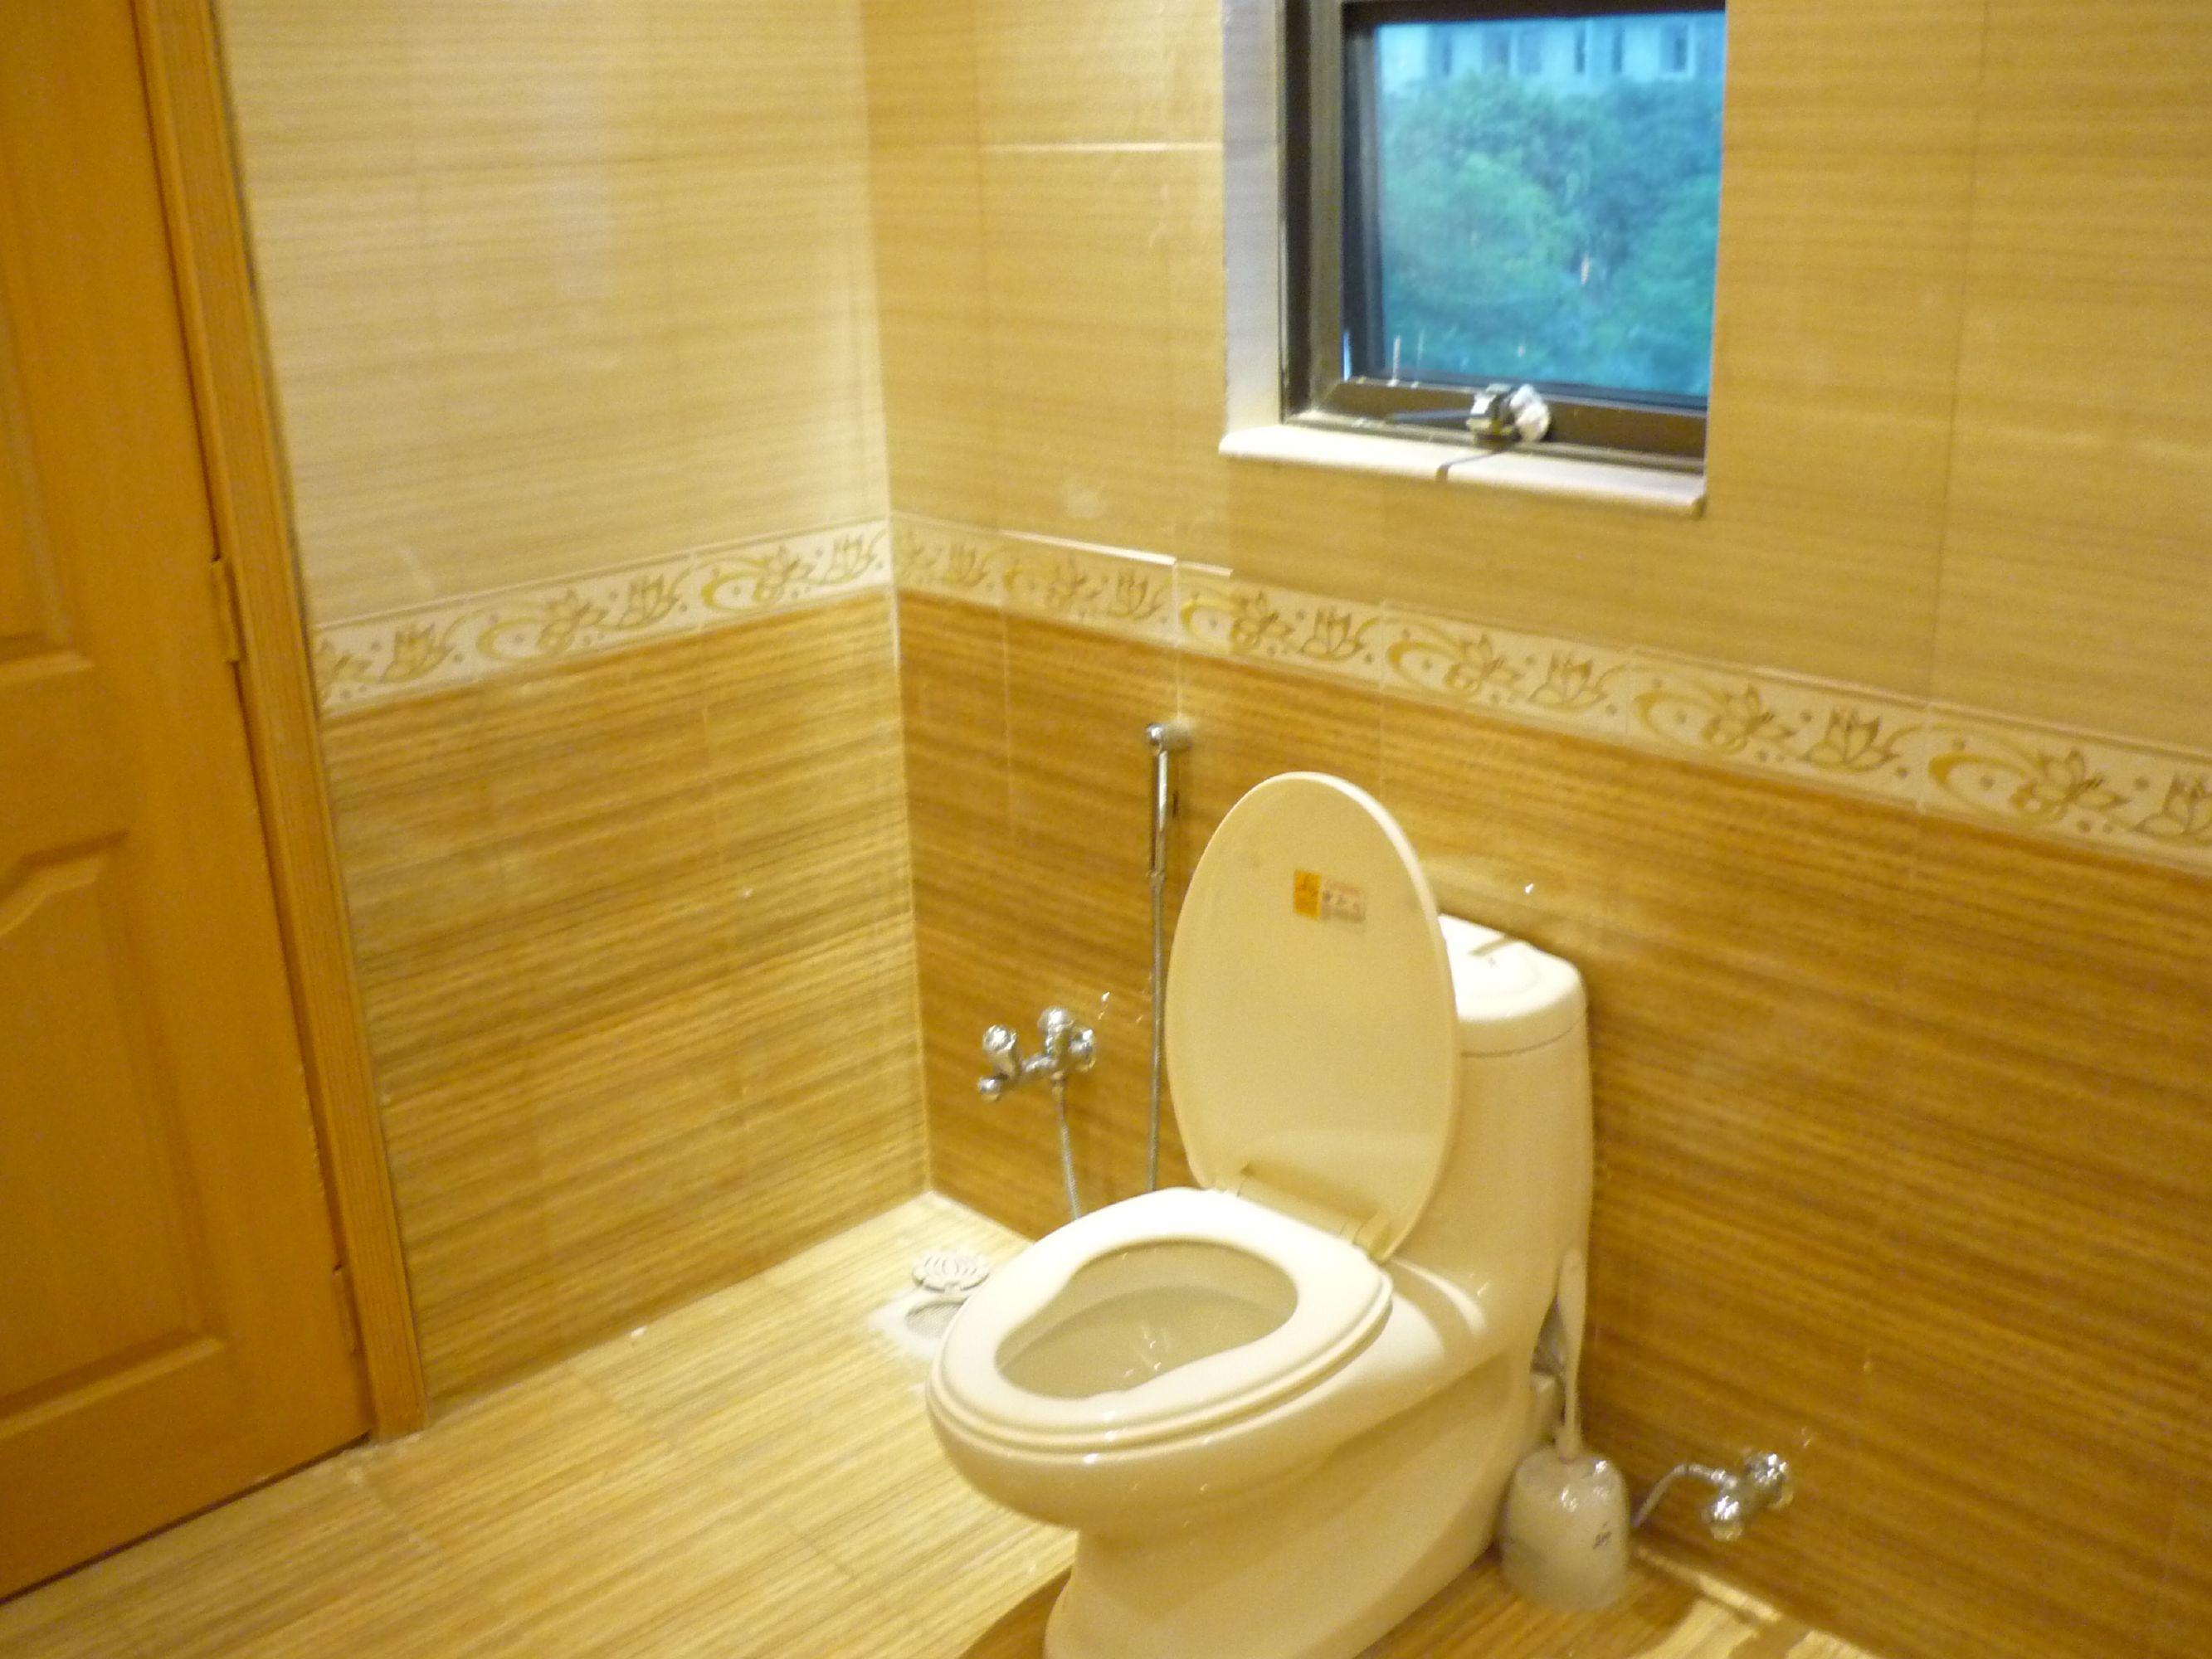 Toilet, Bathroom, Interior, Plumbings, Restroom, HQ Photo